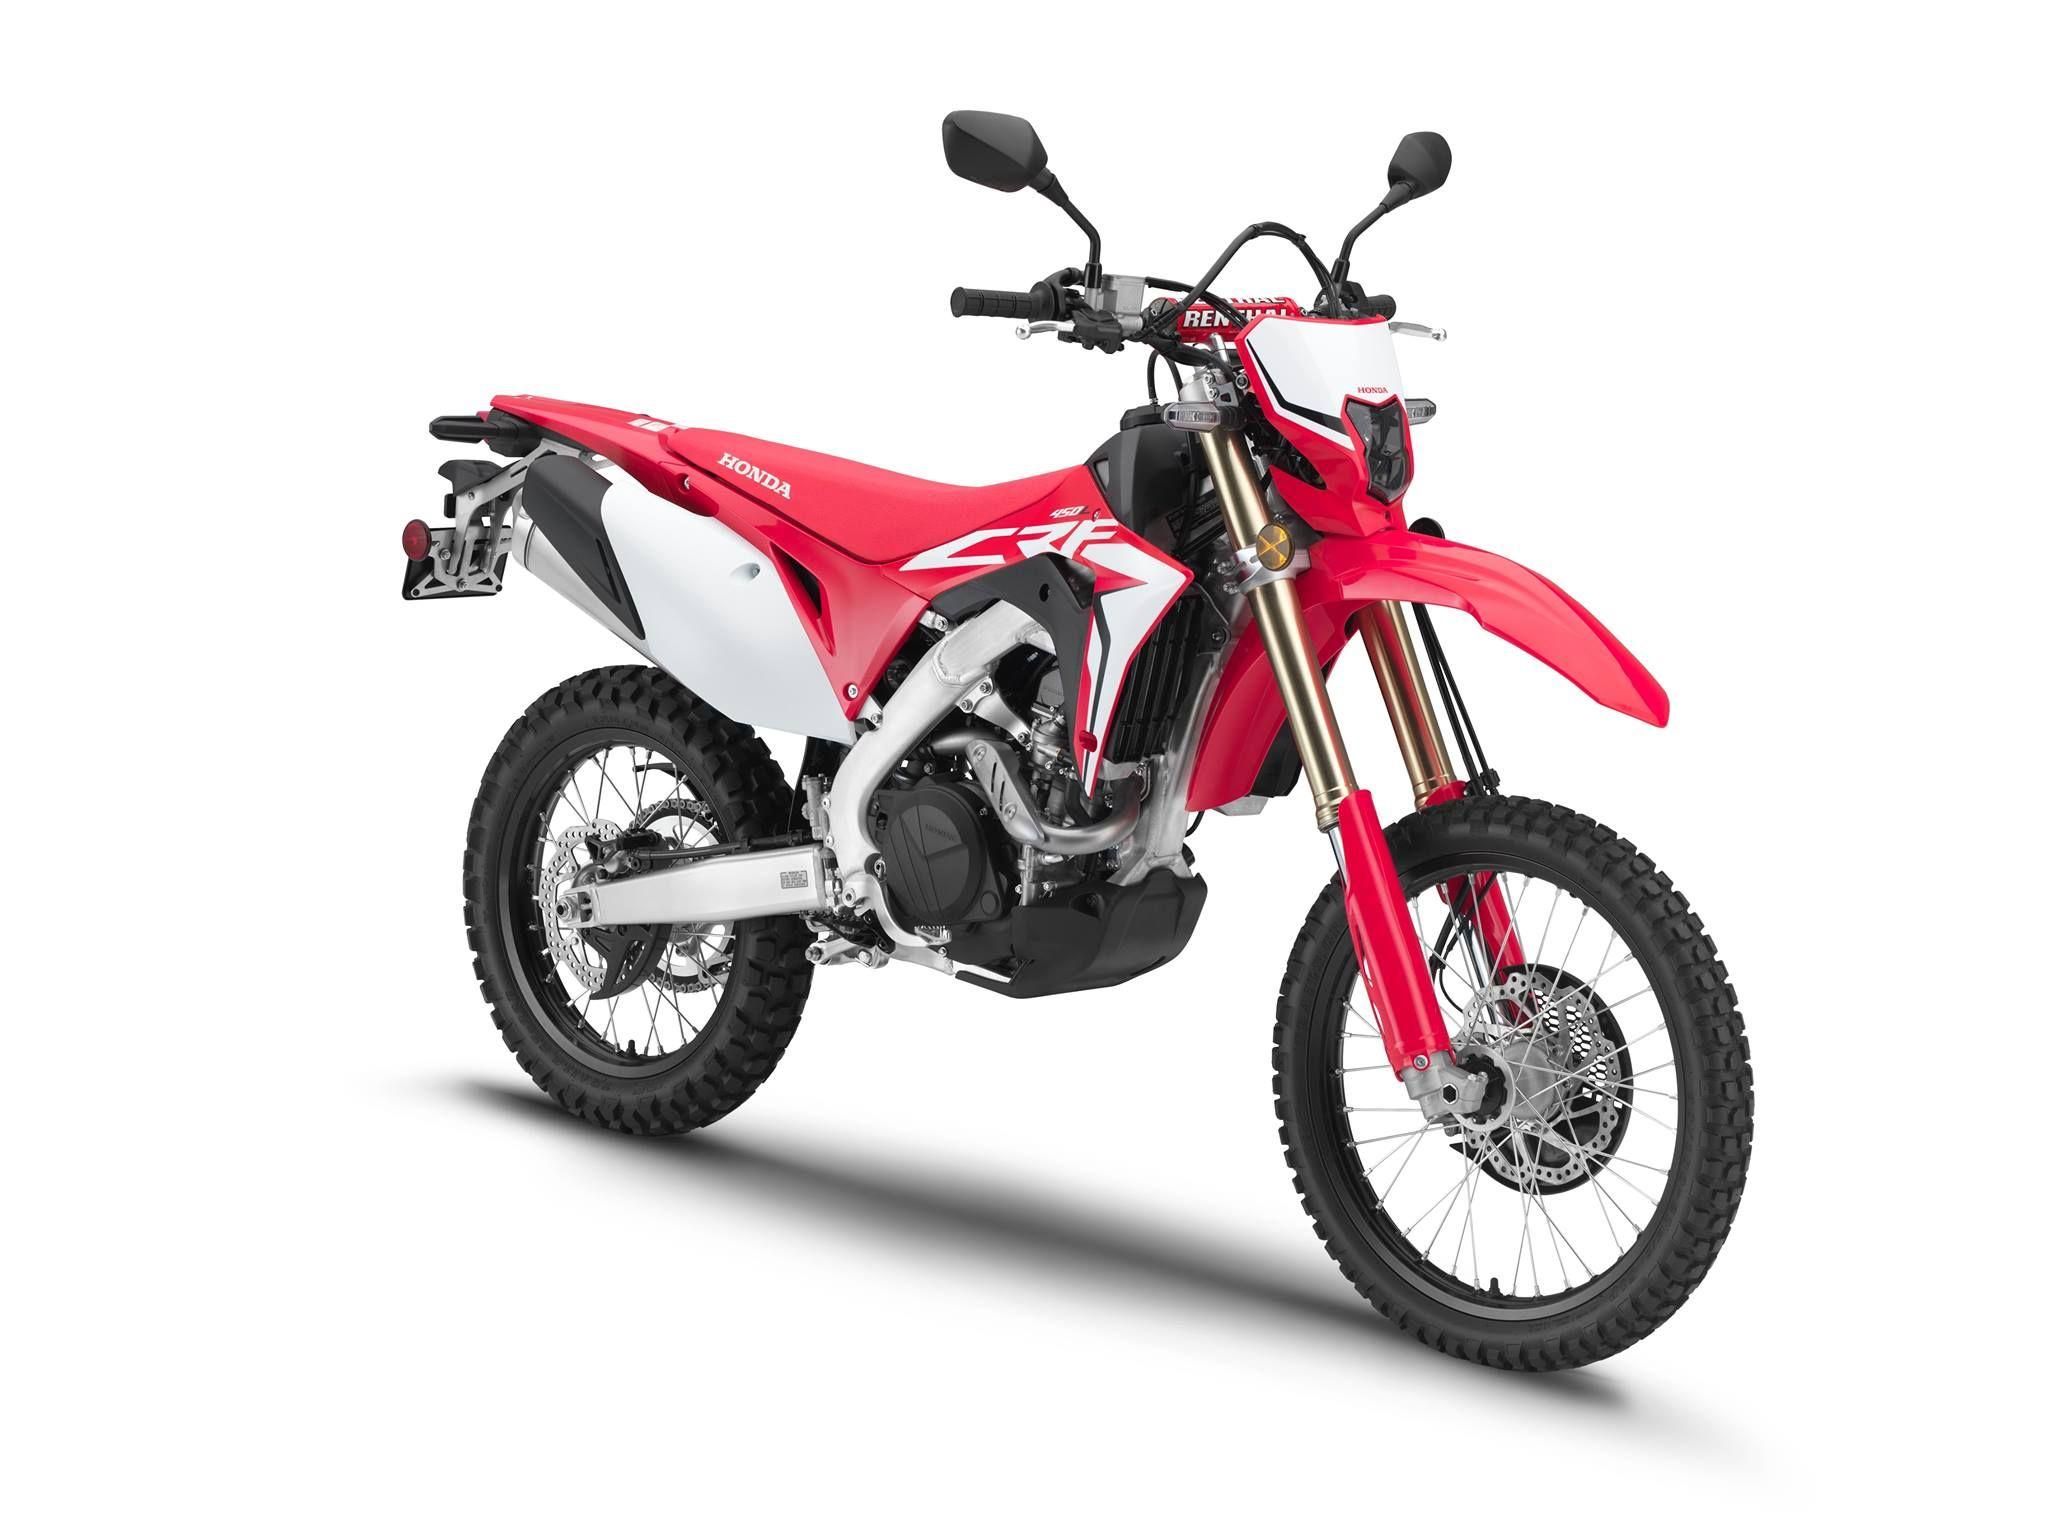 Motocicletas para la montaña